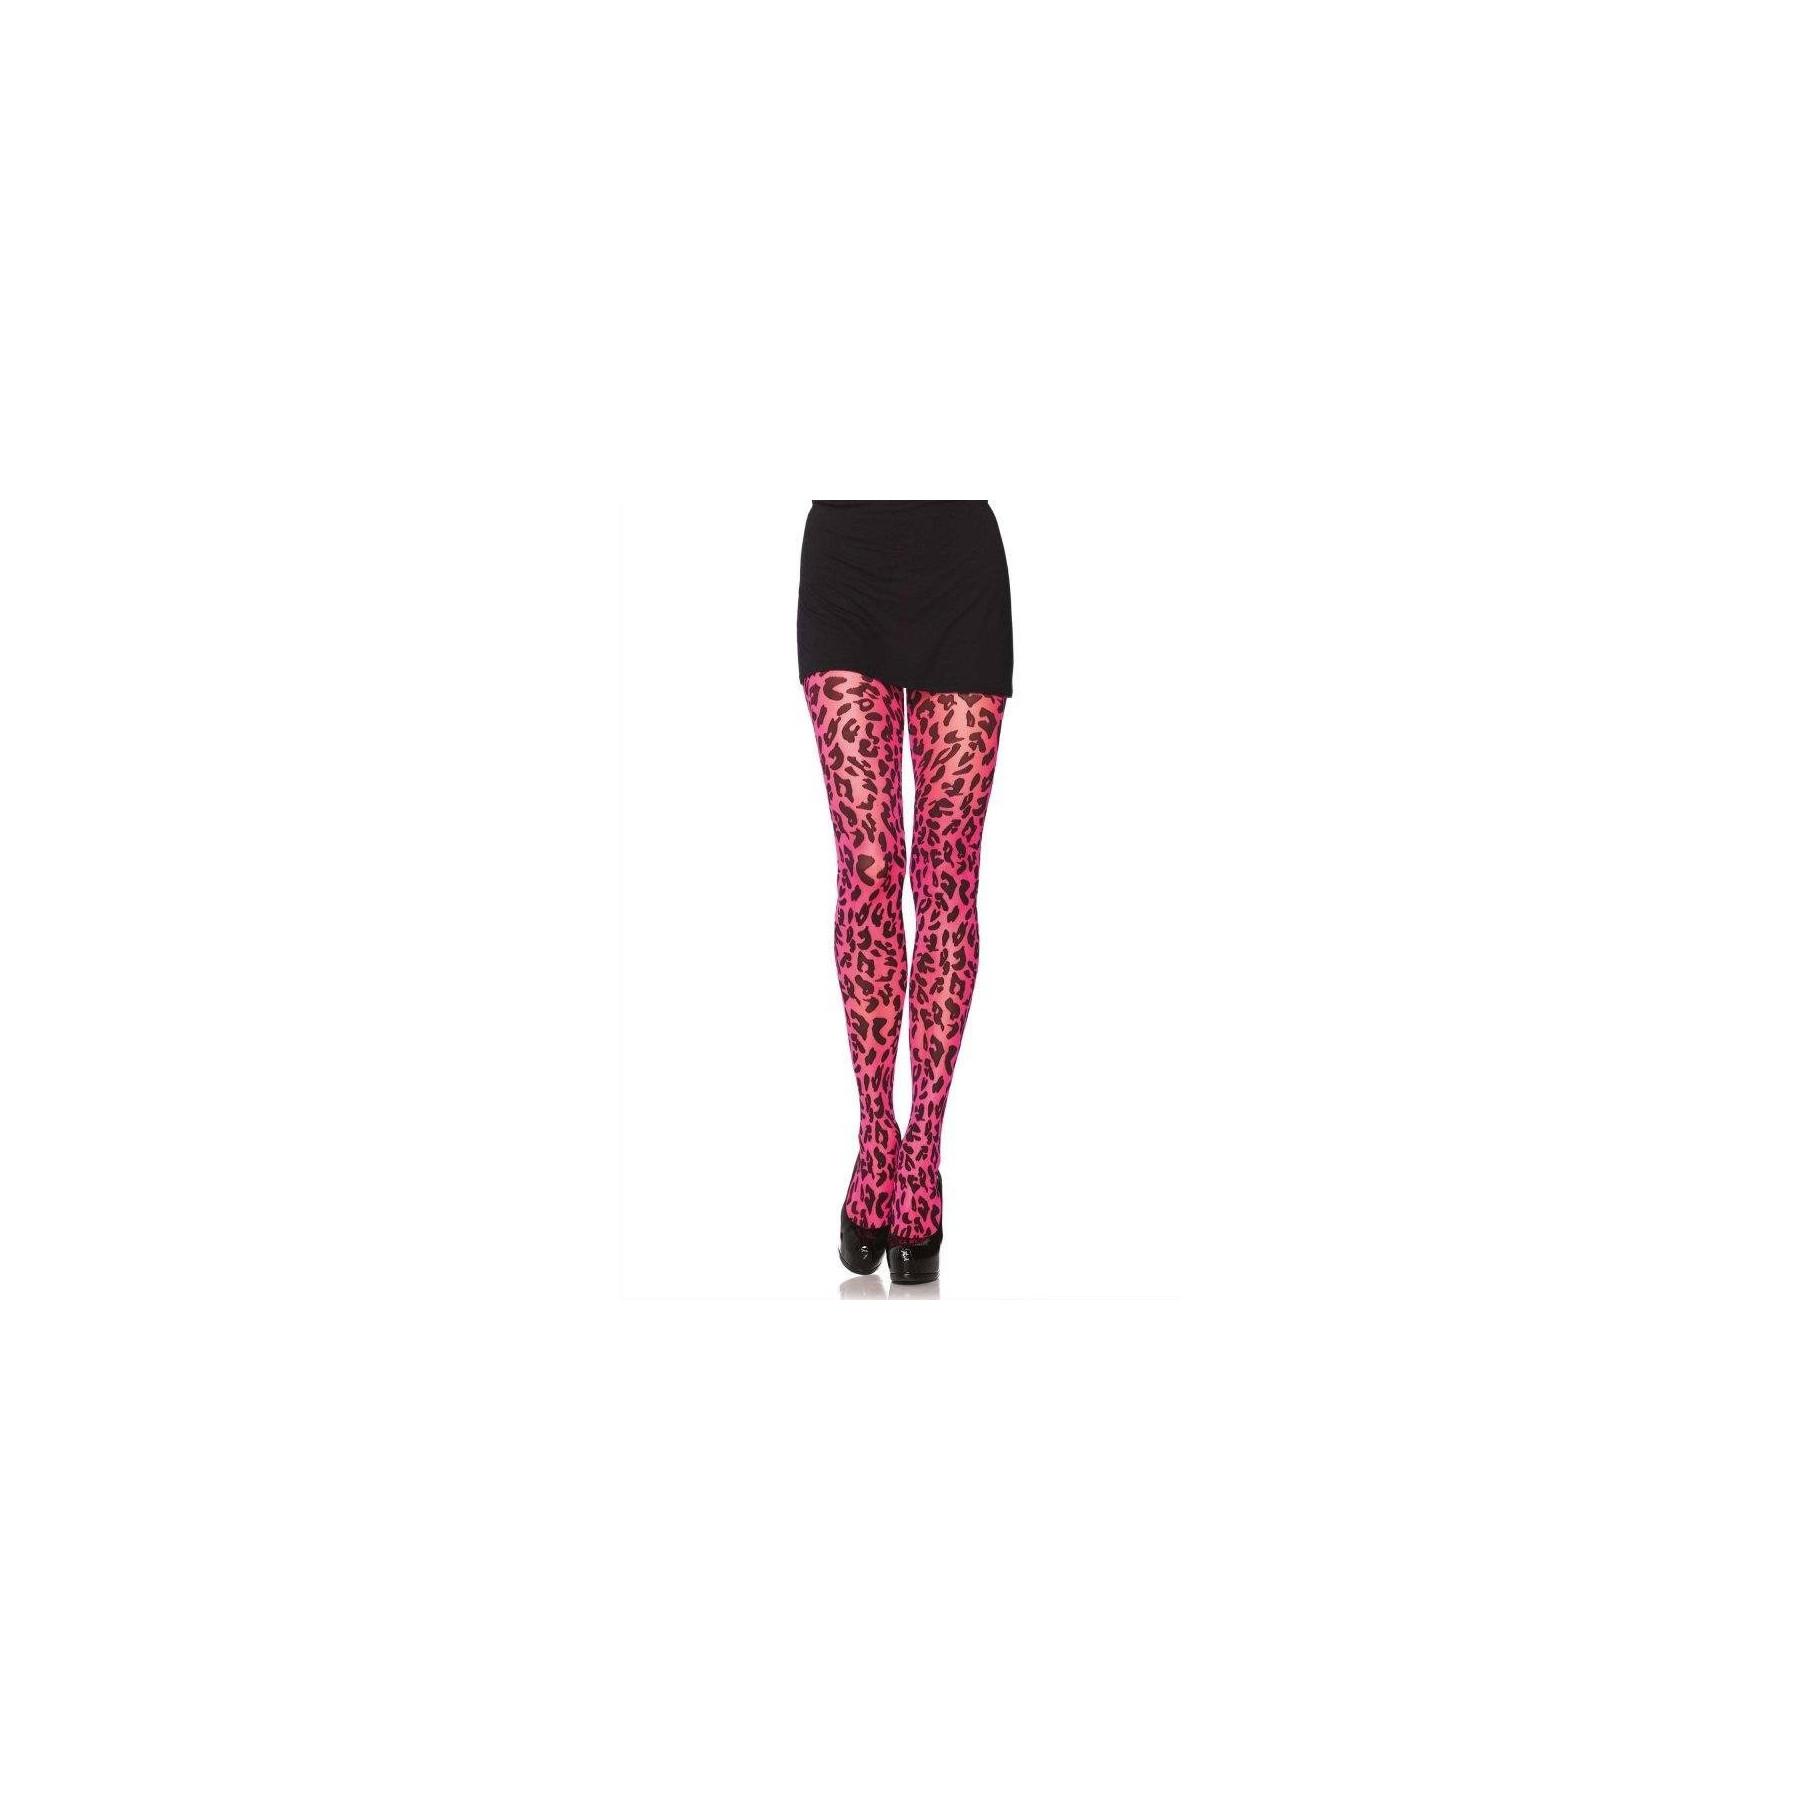 Calze stampa leopardo rosa